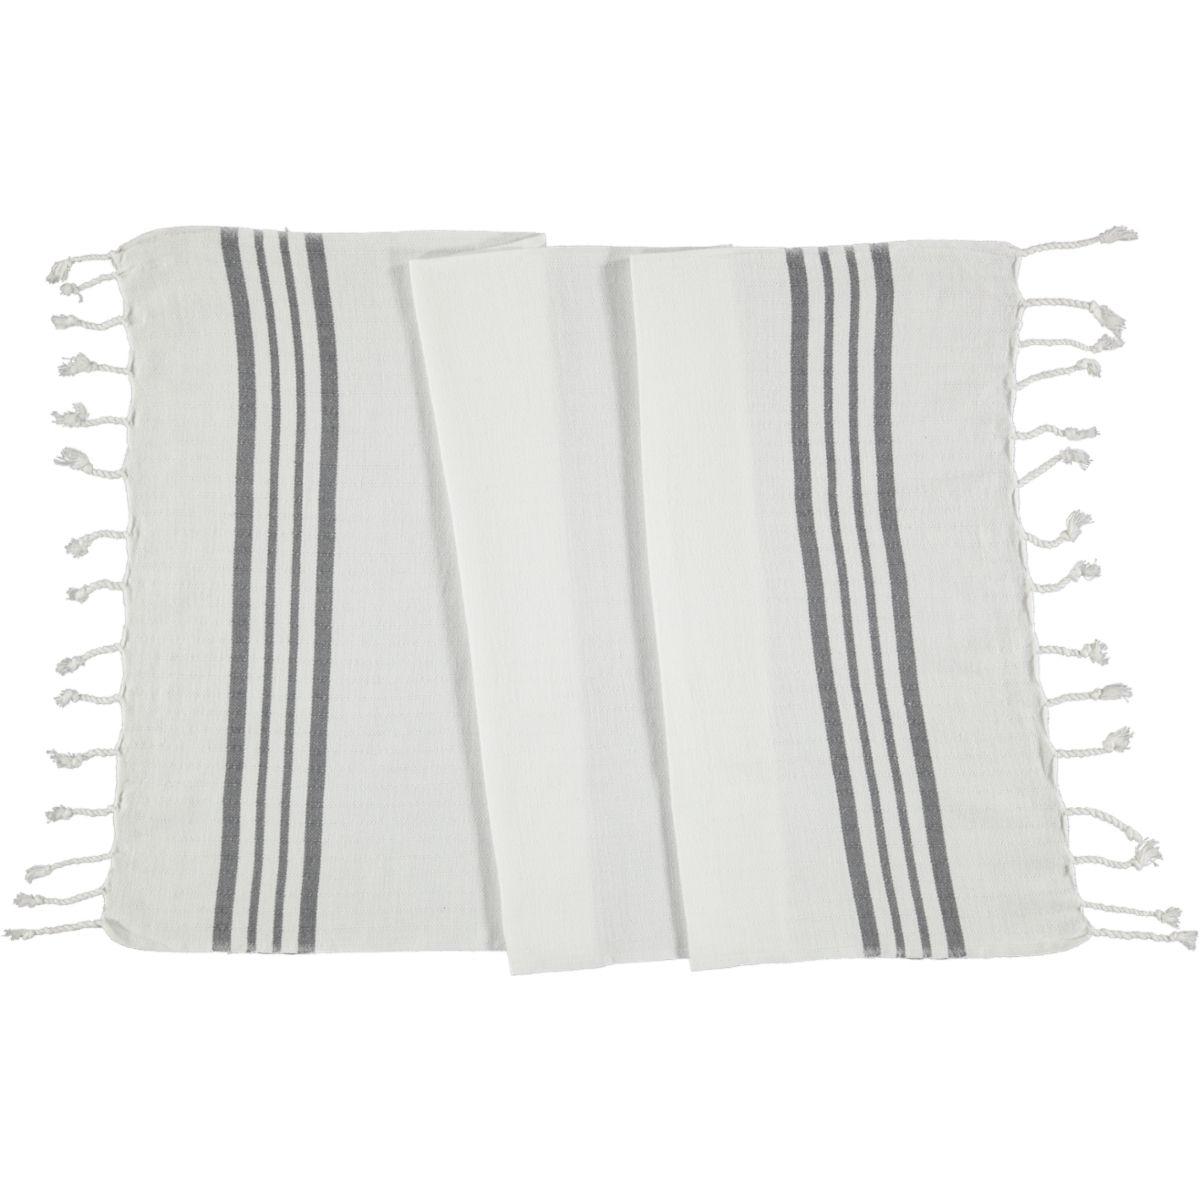 Peshkir - White Sultan / Dark Grey Stripes